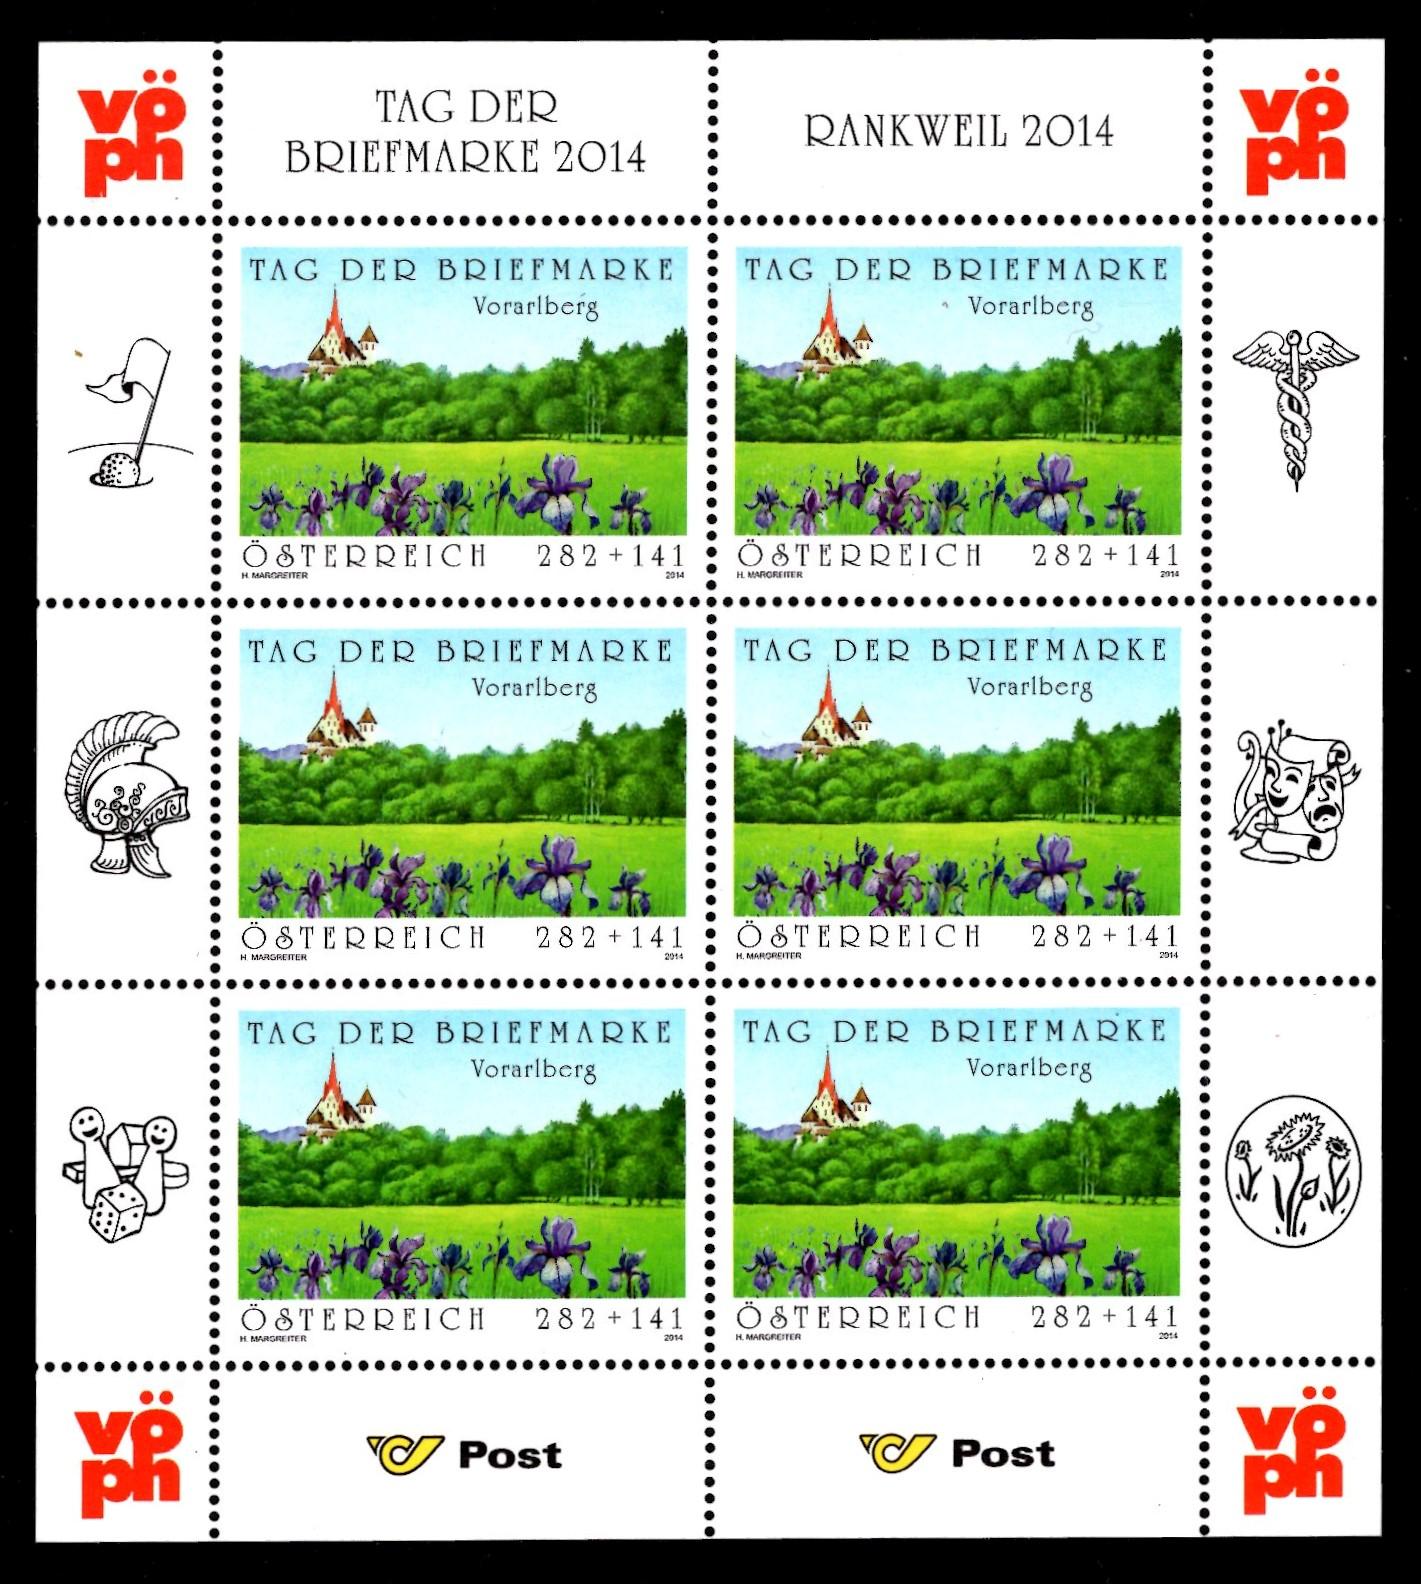 Österr KLBG Tag der Briefmarke 2014 Michel-Nr 3158